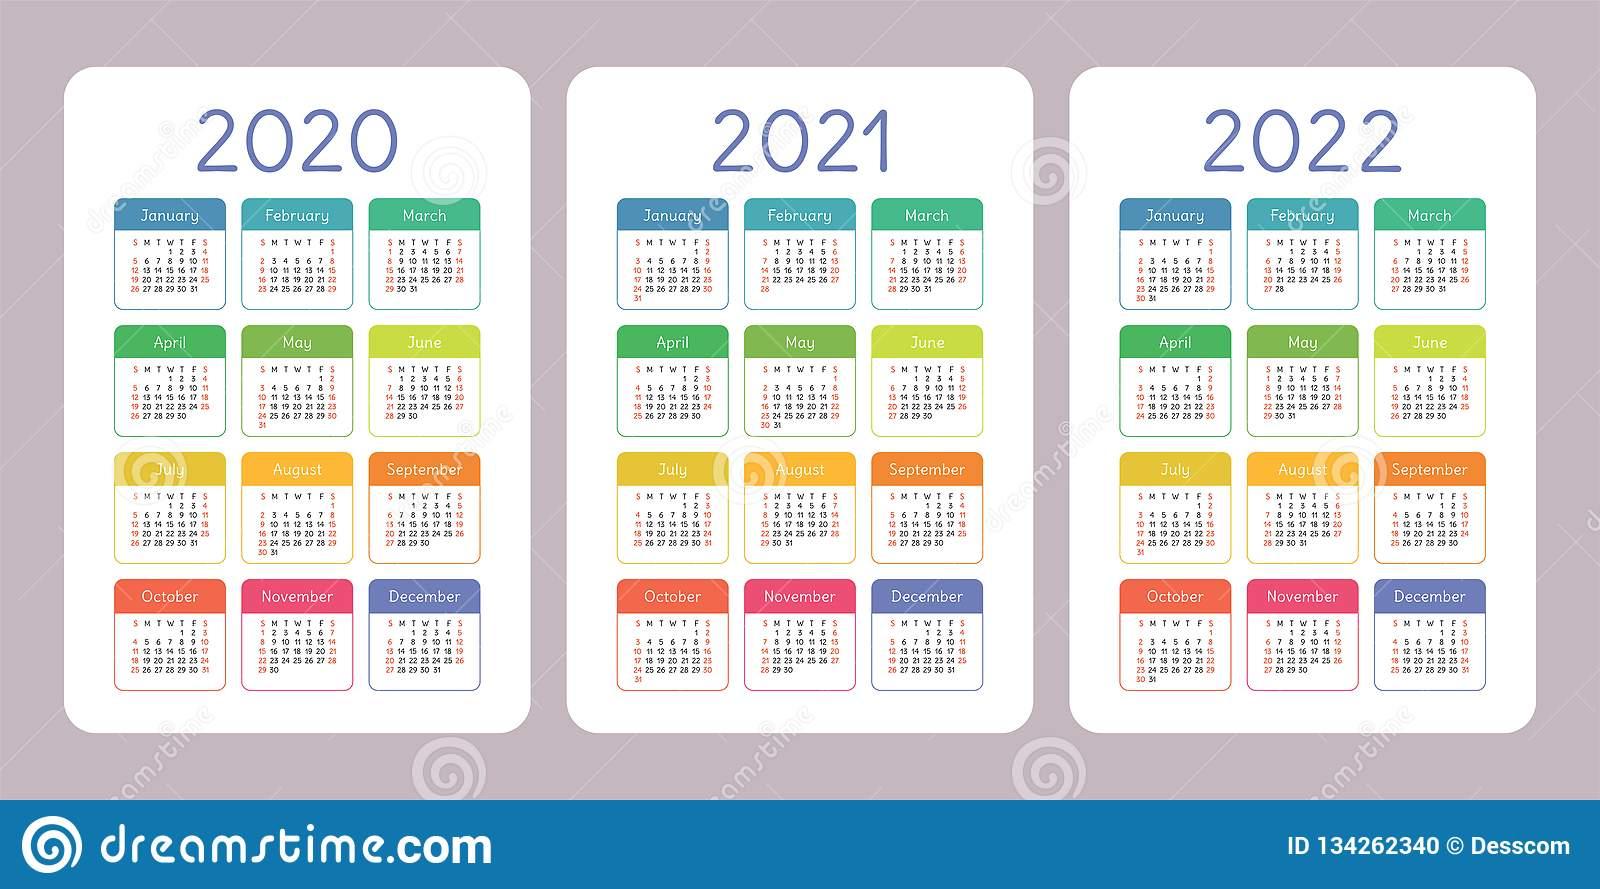 Calendar 2020, 2021, 2022 Years. Vertical Vector Calender